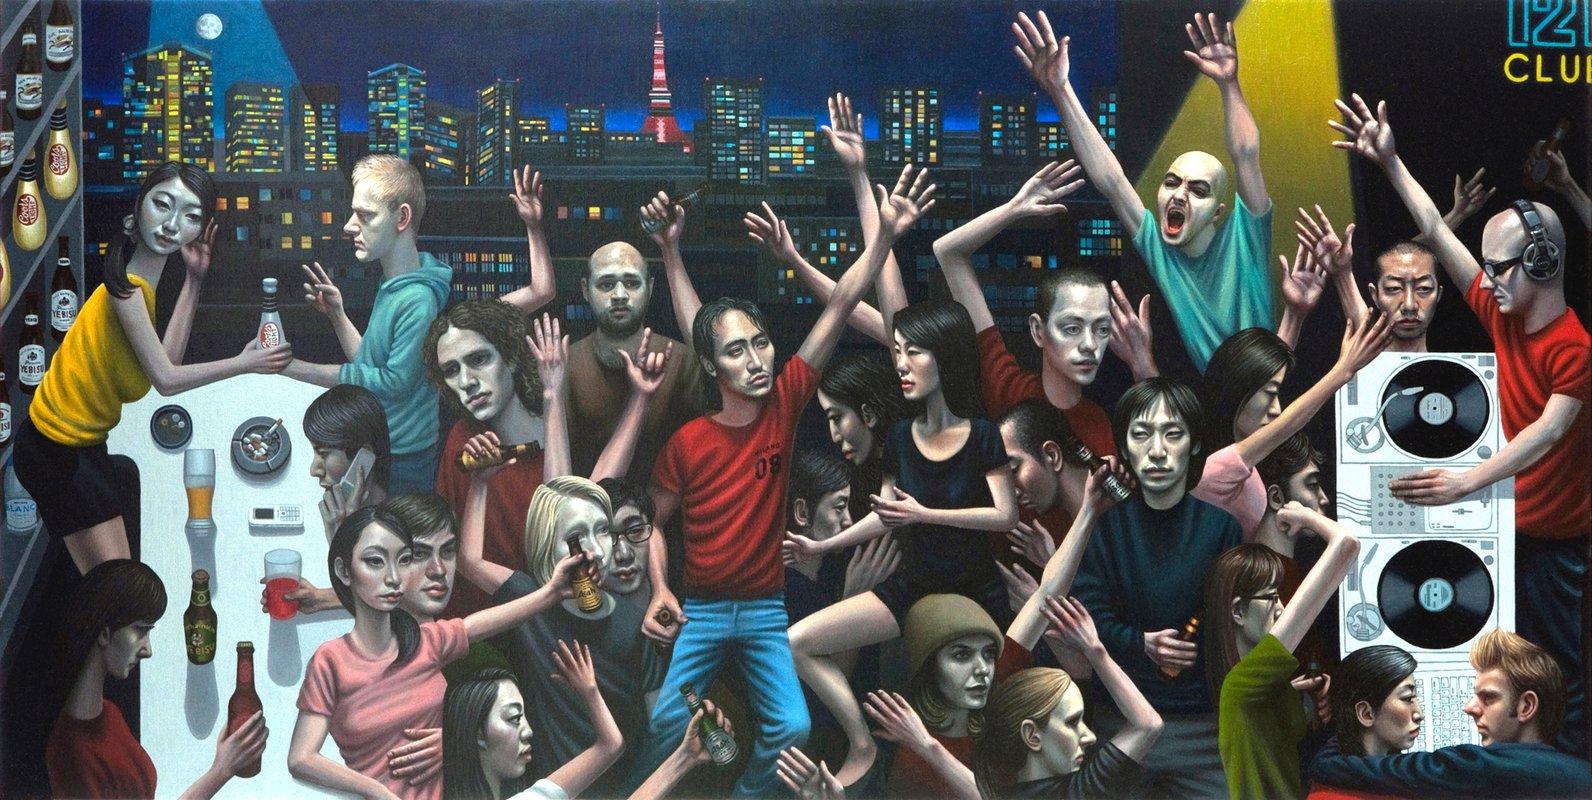 Roppongi Nightclub by Carl Randall<span>Copyright Carl Randall</span>